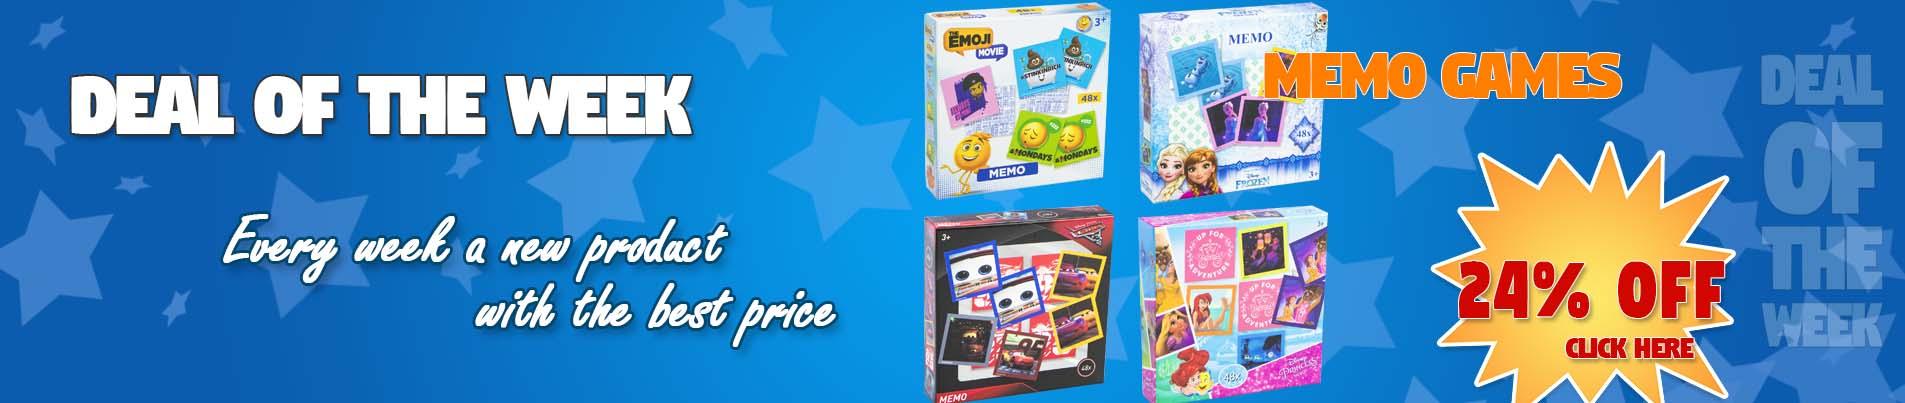 Disney-Memo-Spiele im Großhandel